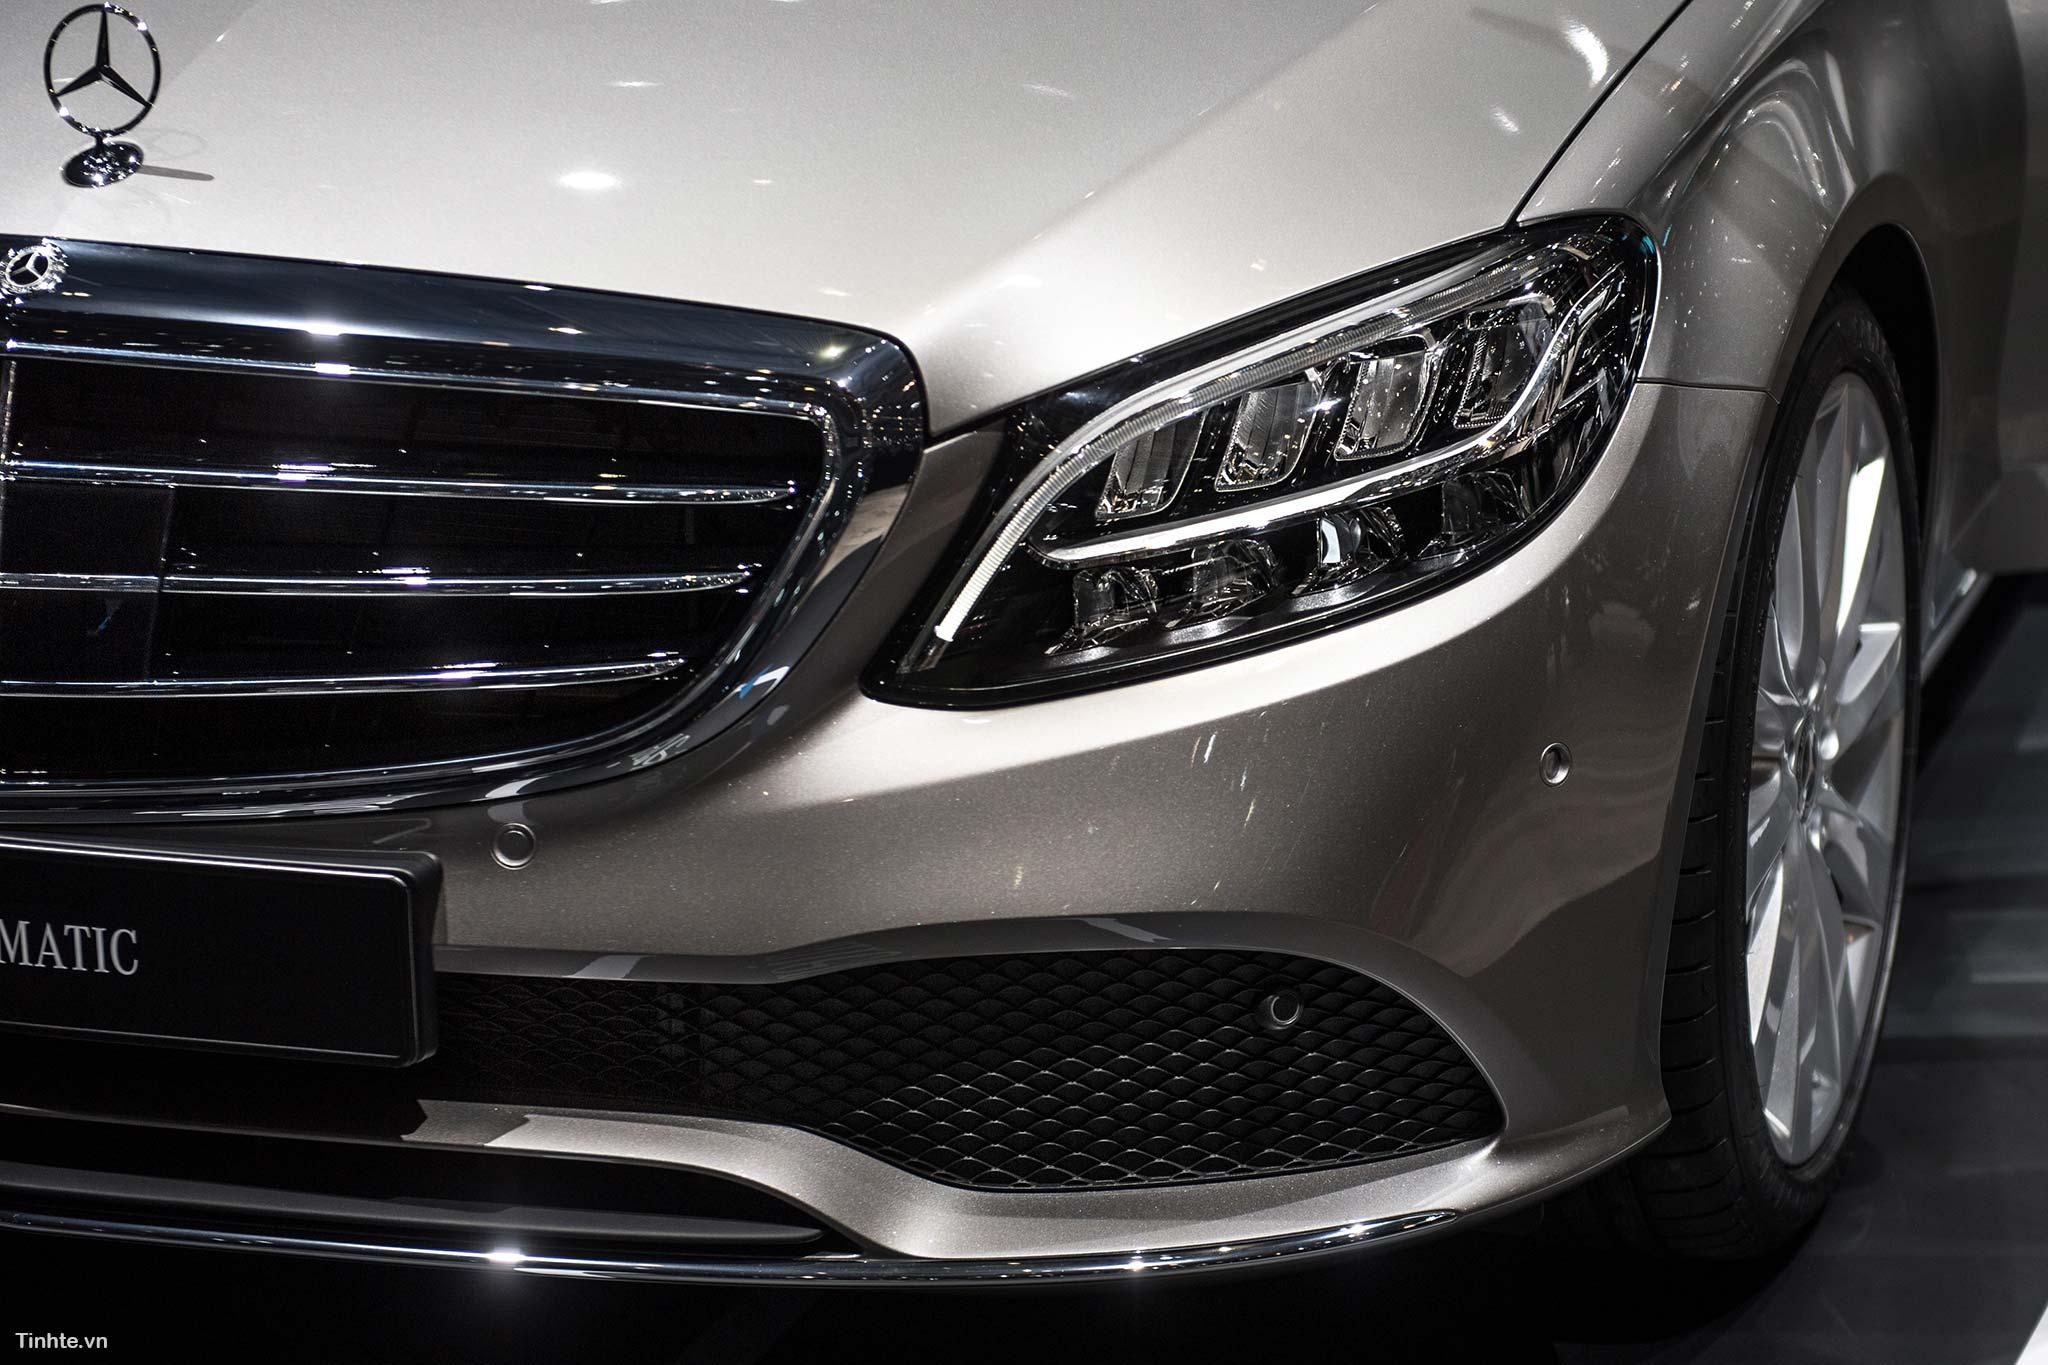 tinhte_Mercedes-Benz-C-200-4MATIC-3.jpg